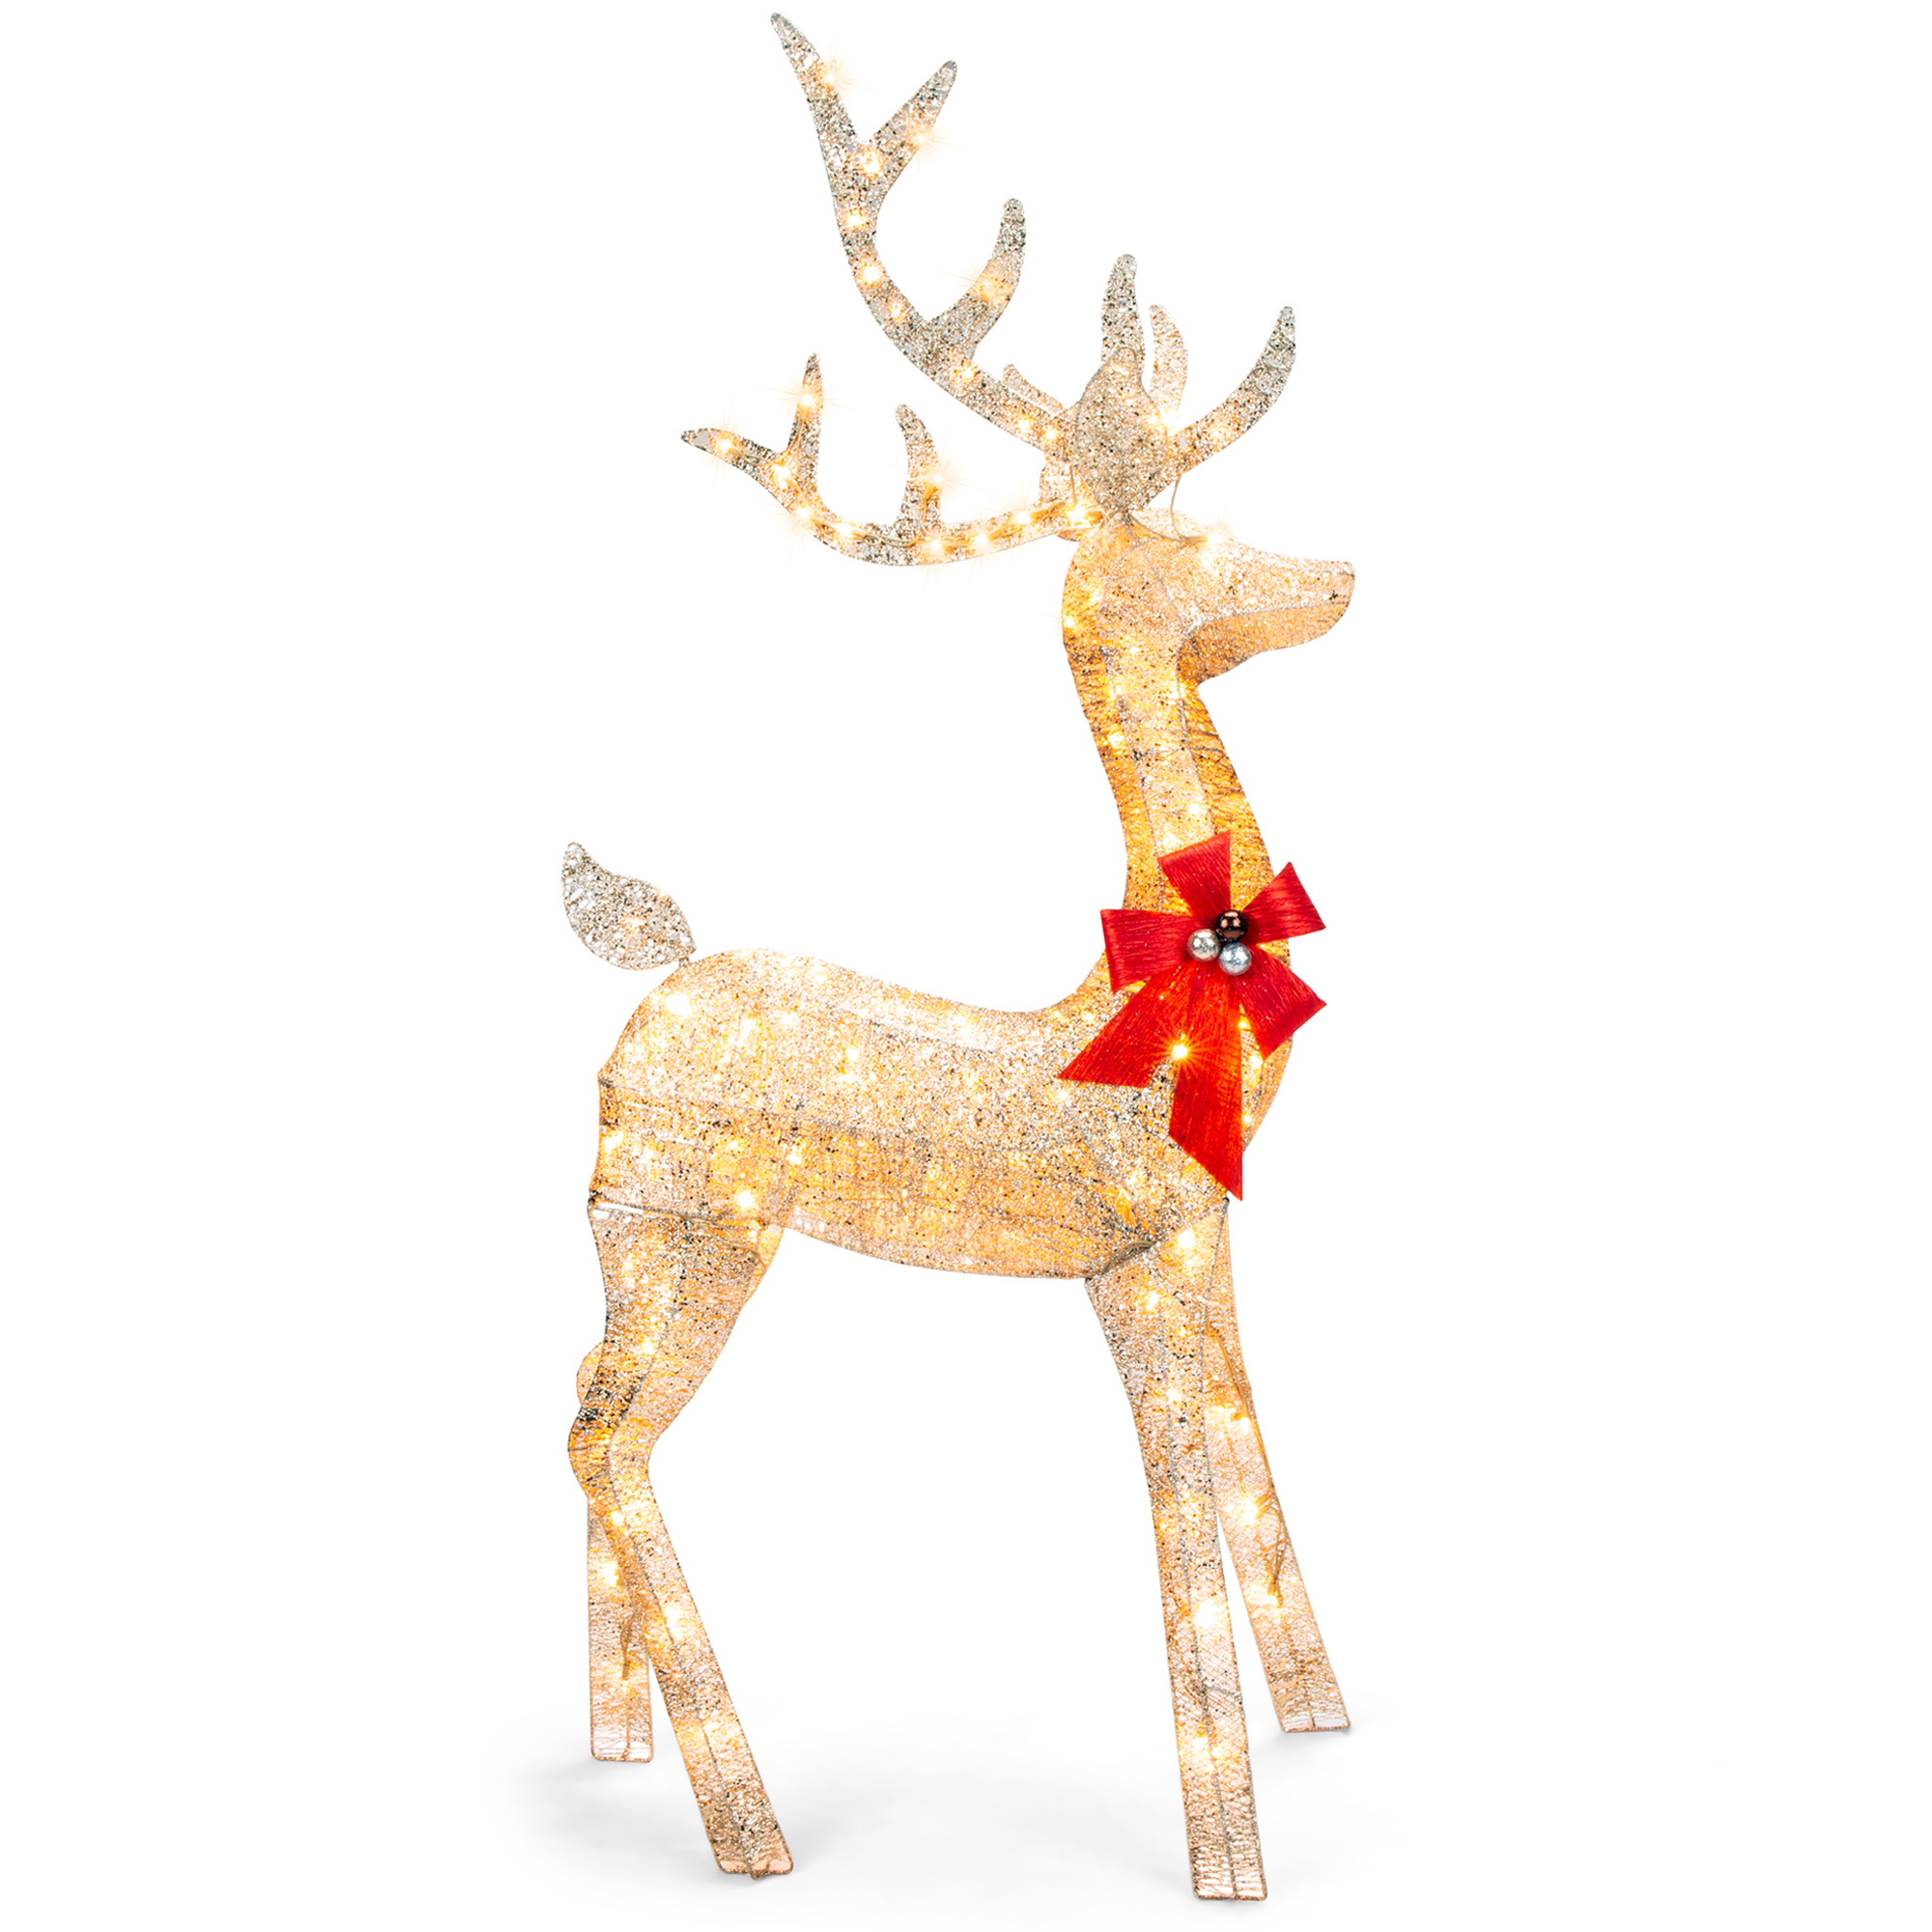 Best Choice Products 5ft 3d Pre Lit Gold Glitter Christmas Reindeer Buck Yard Decoration W 150 Lights Stakes Zip Ties Walmart Com Walmart Com